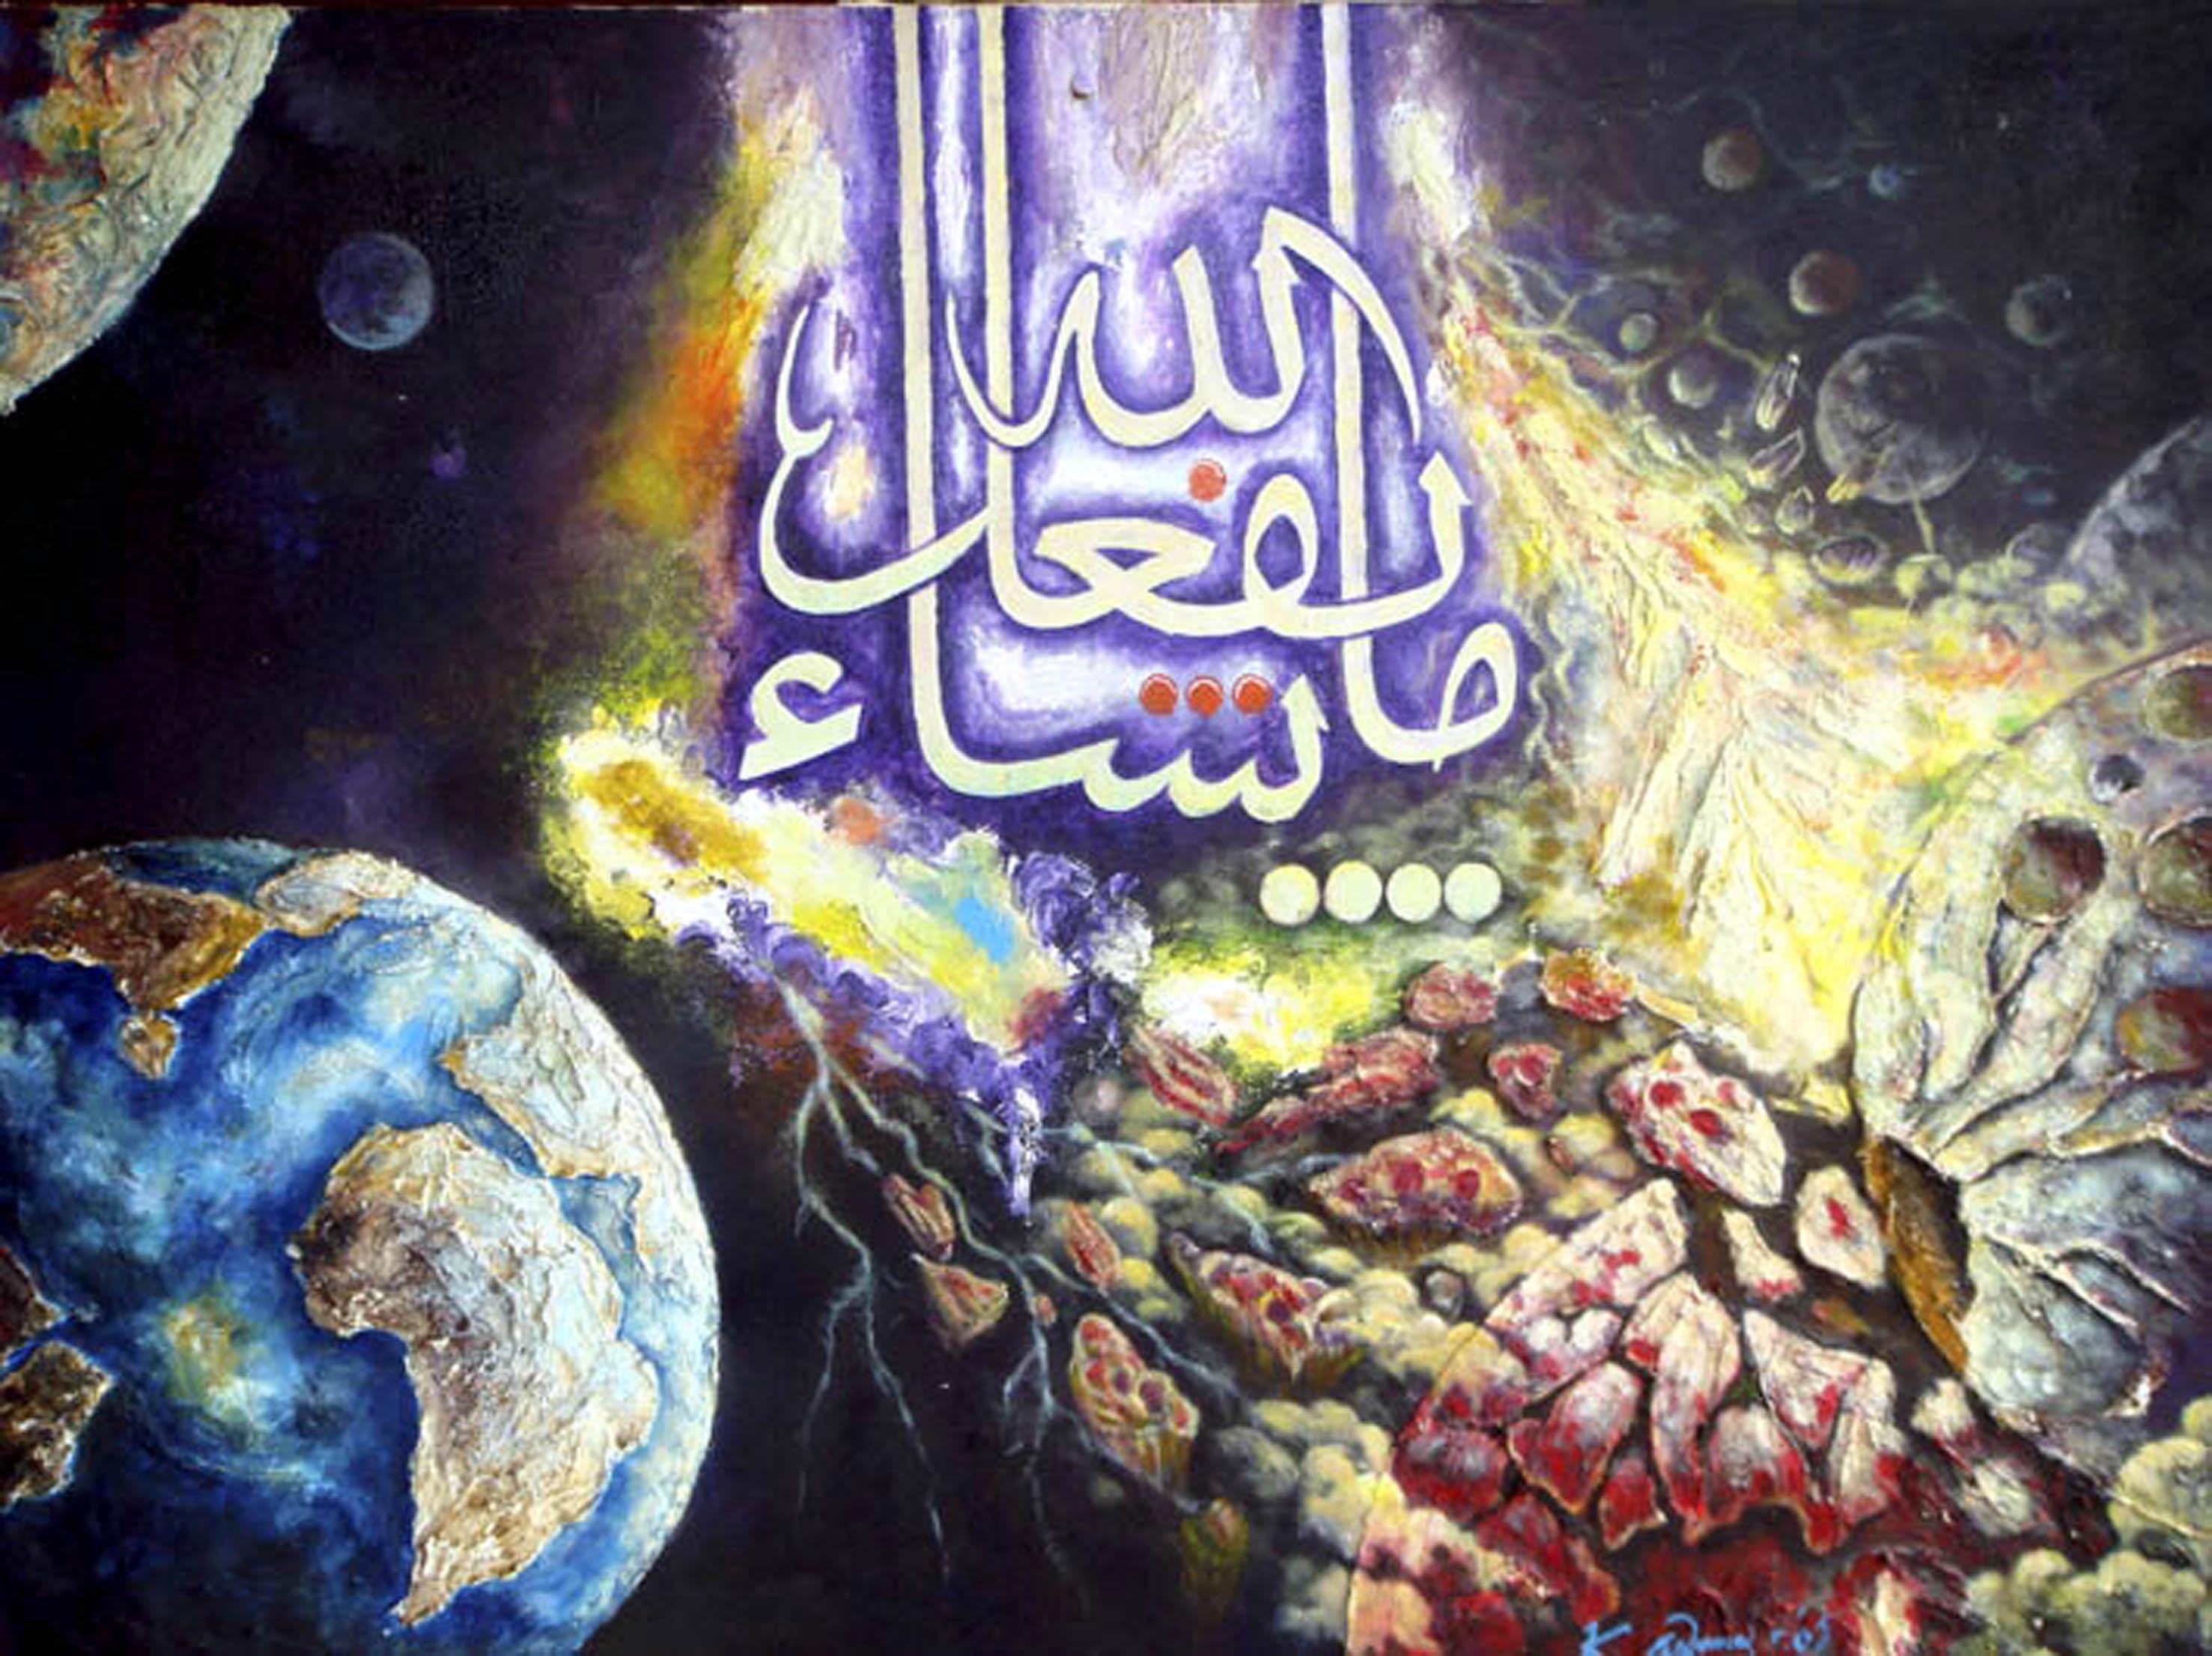 Gambar Islami Kaligrafi PatriaZone Wawasan Islam Dan Iptek